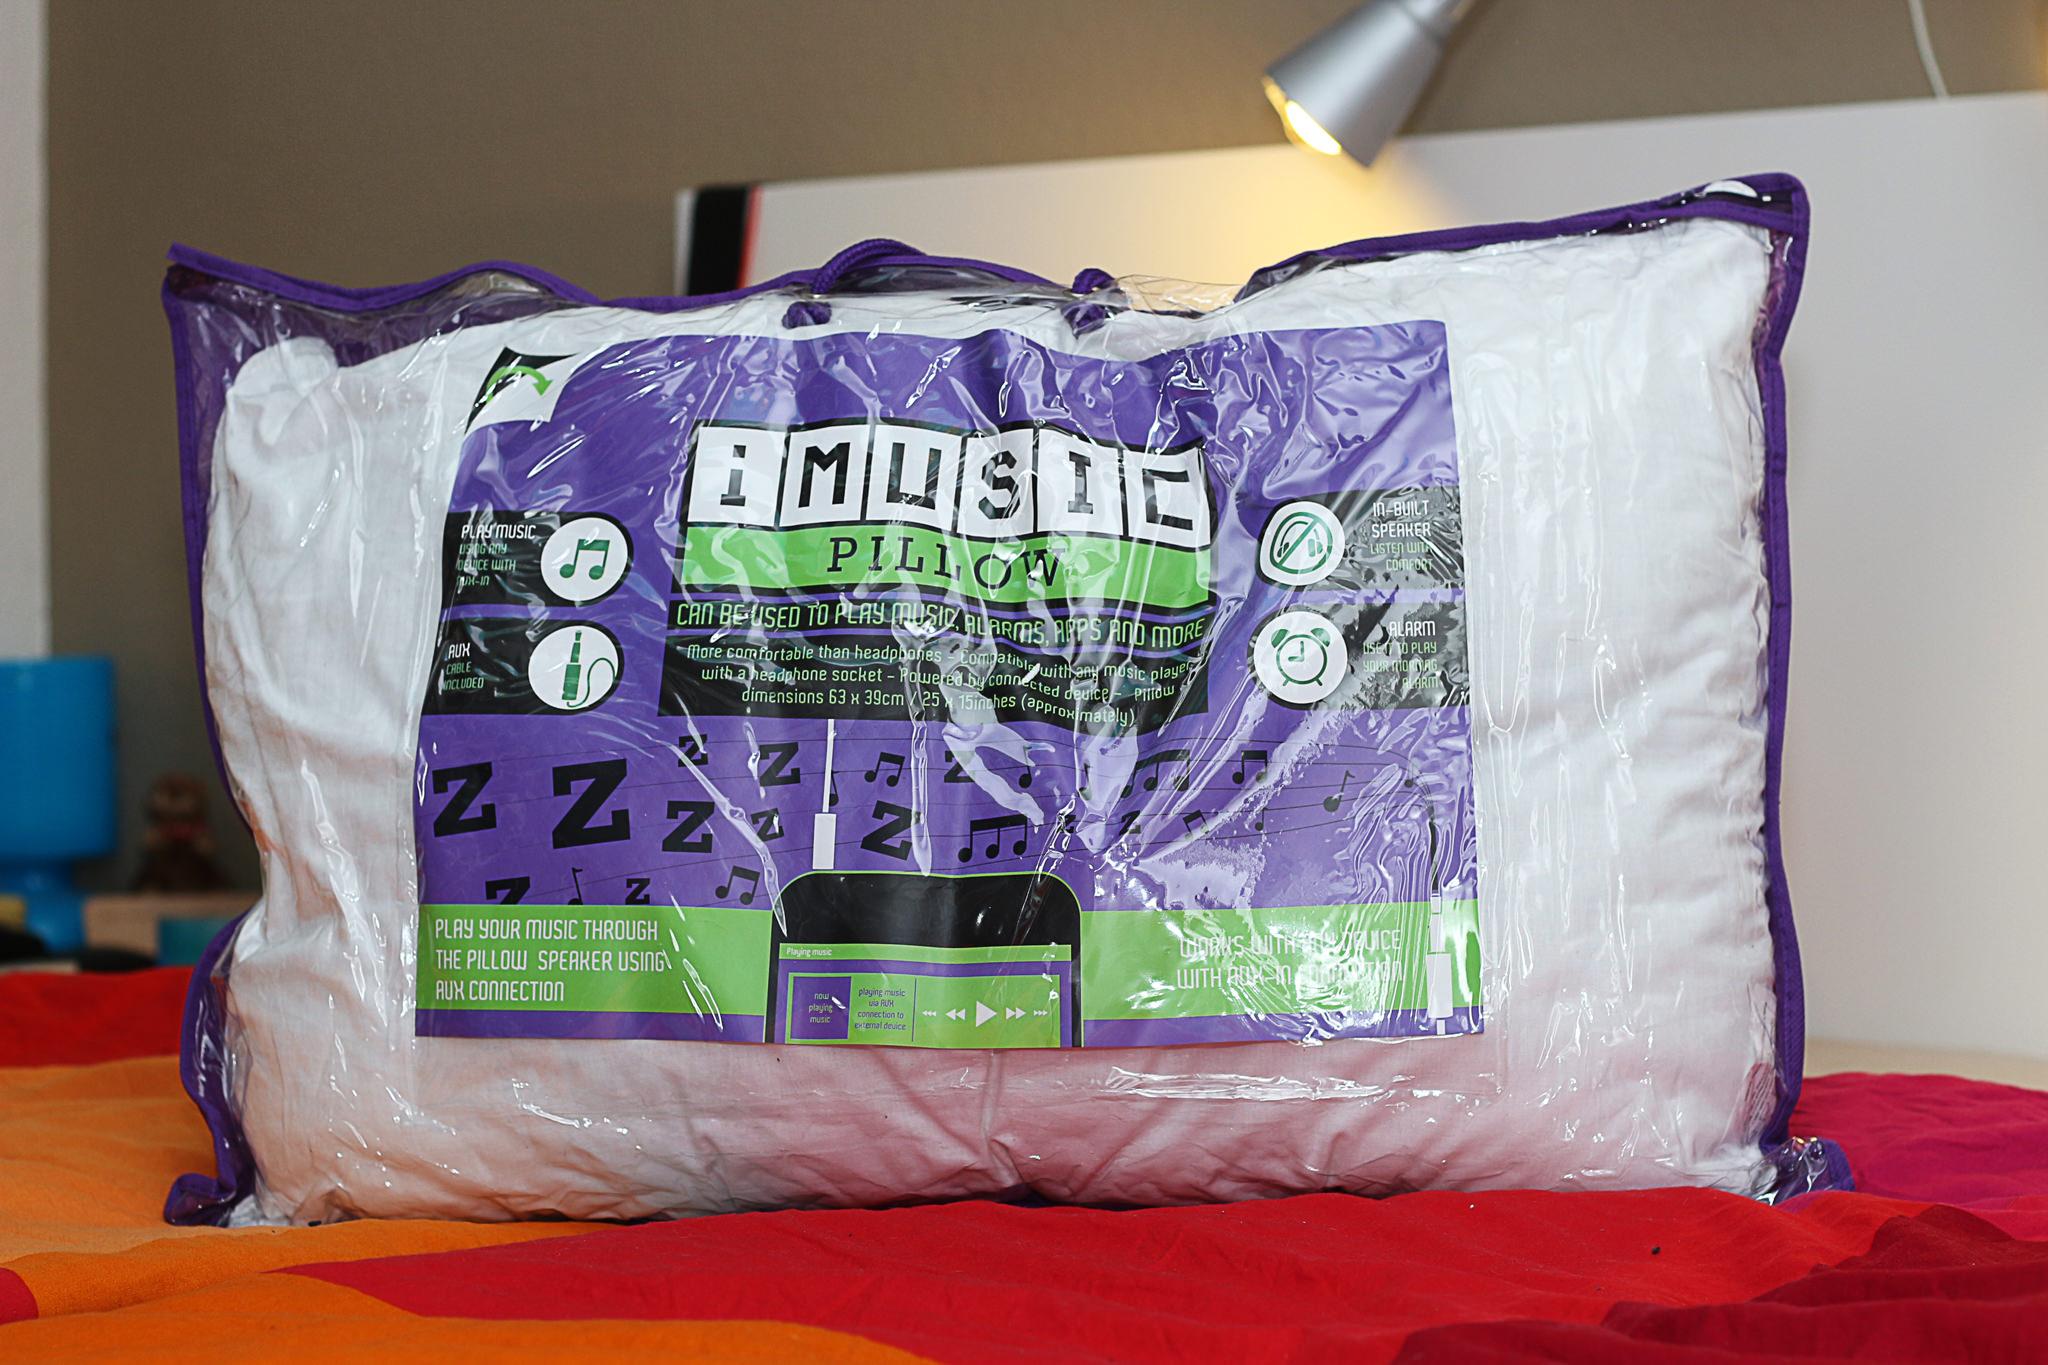 imusic-pillow-2